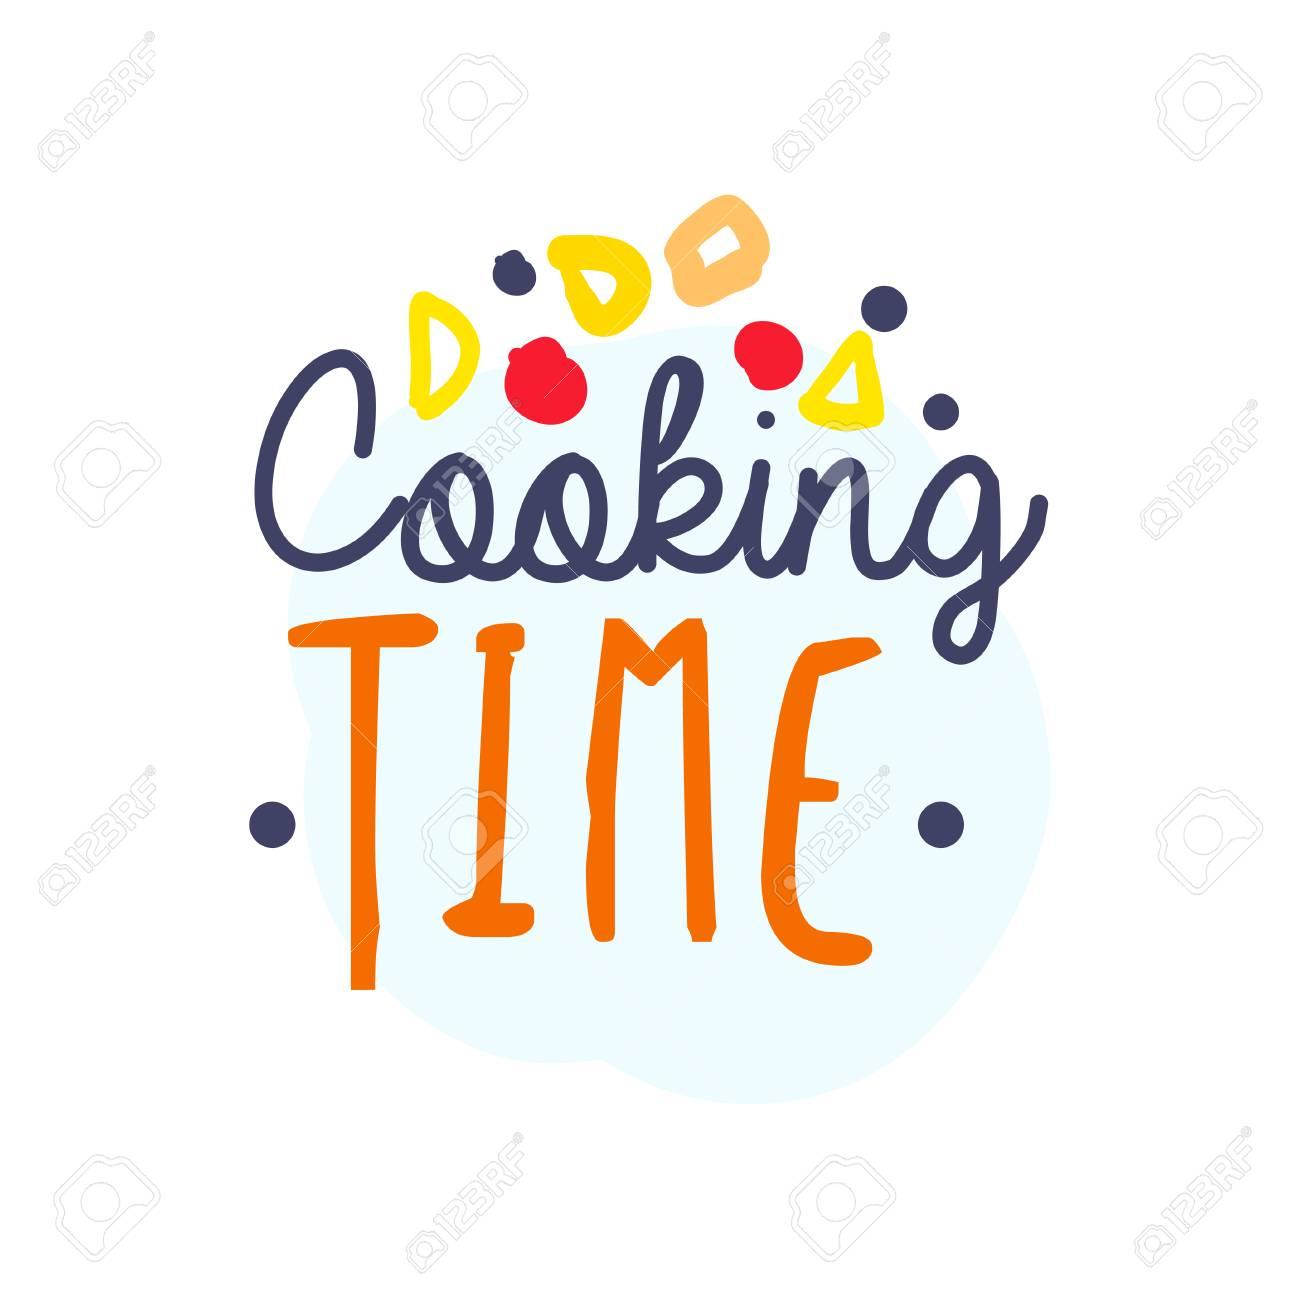 Colorful Handmade Badge Or Label Design For Cooking Food Handwritten Lettering Logo